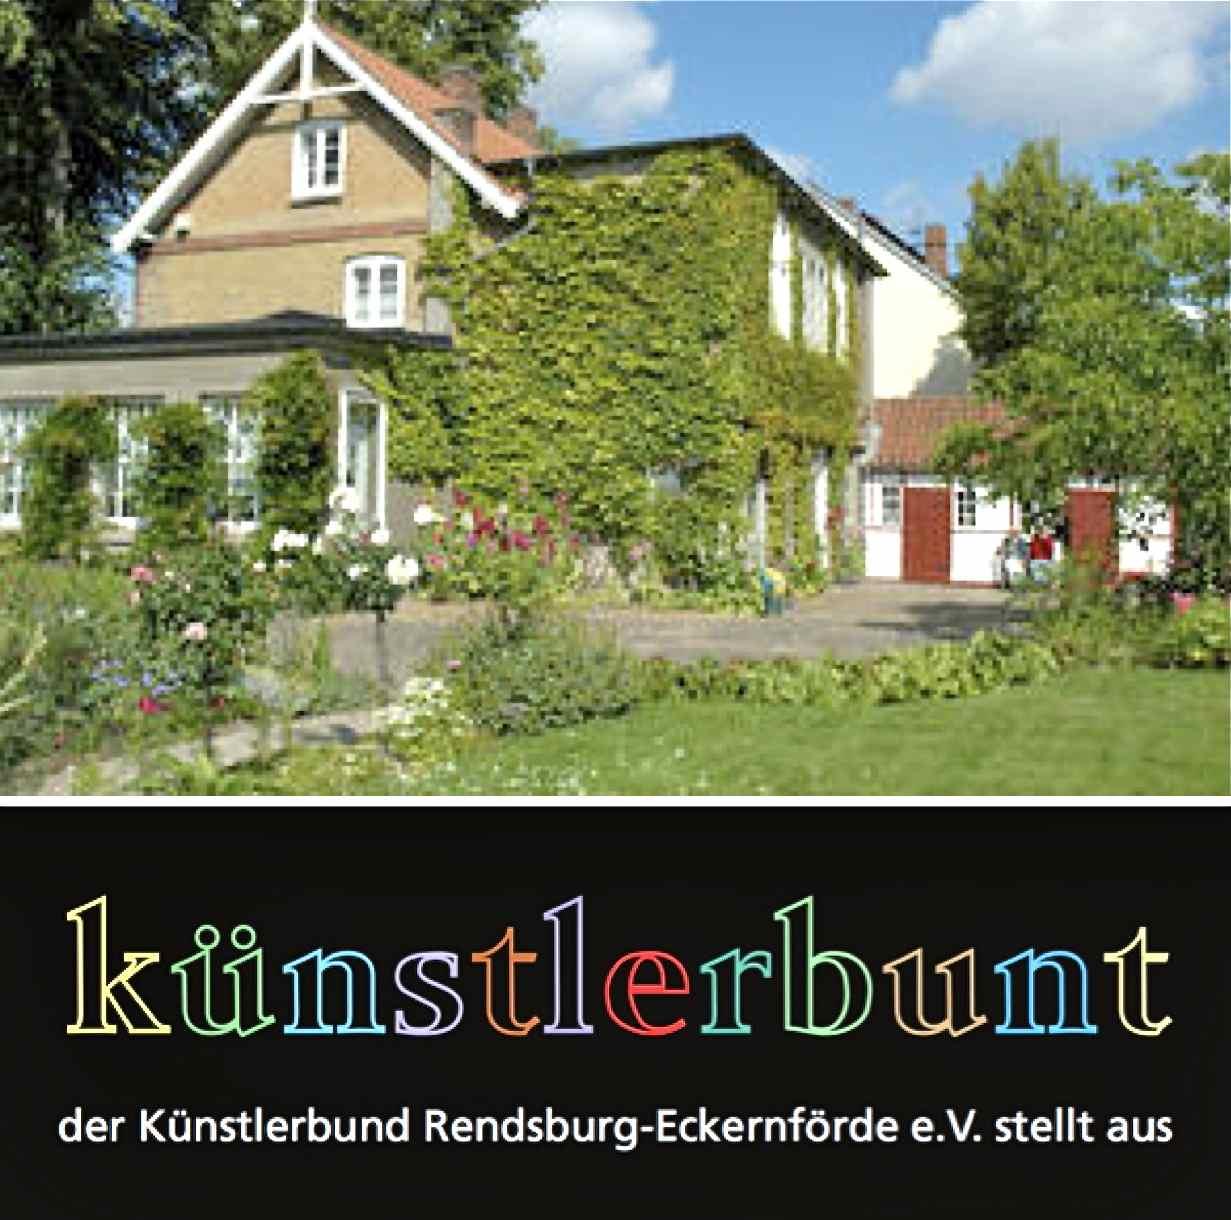 künstlermuseum heikendorf gründung